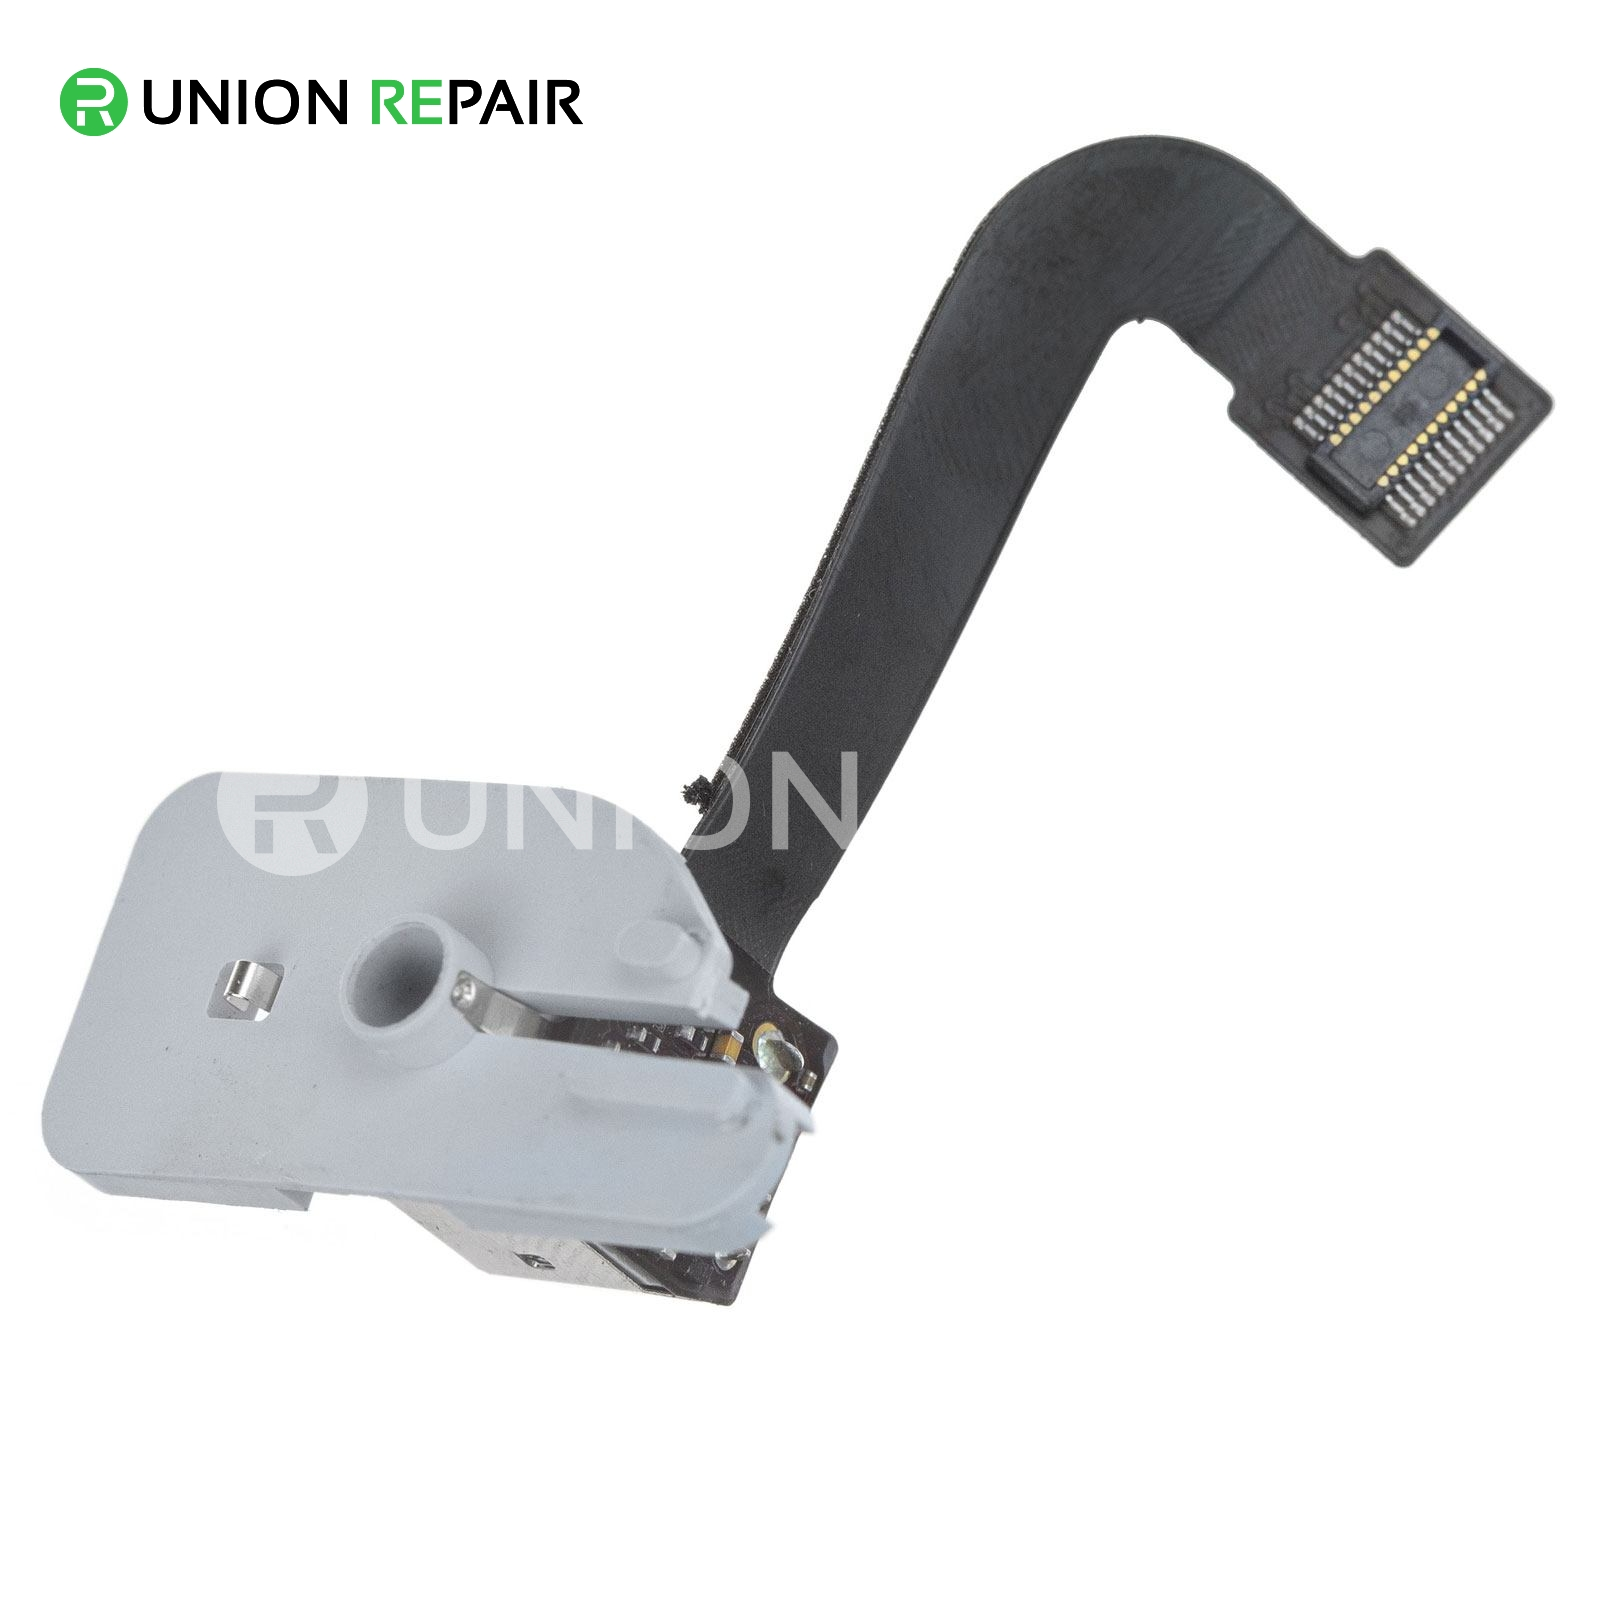 Ipod Earphones Wiring Diagram on earphone accessories, earphone cable, earphone connector diagram,